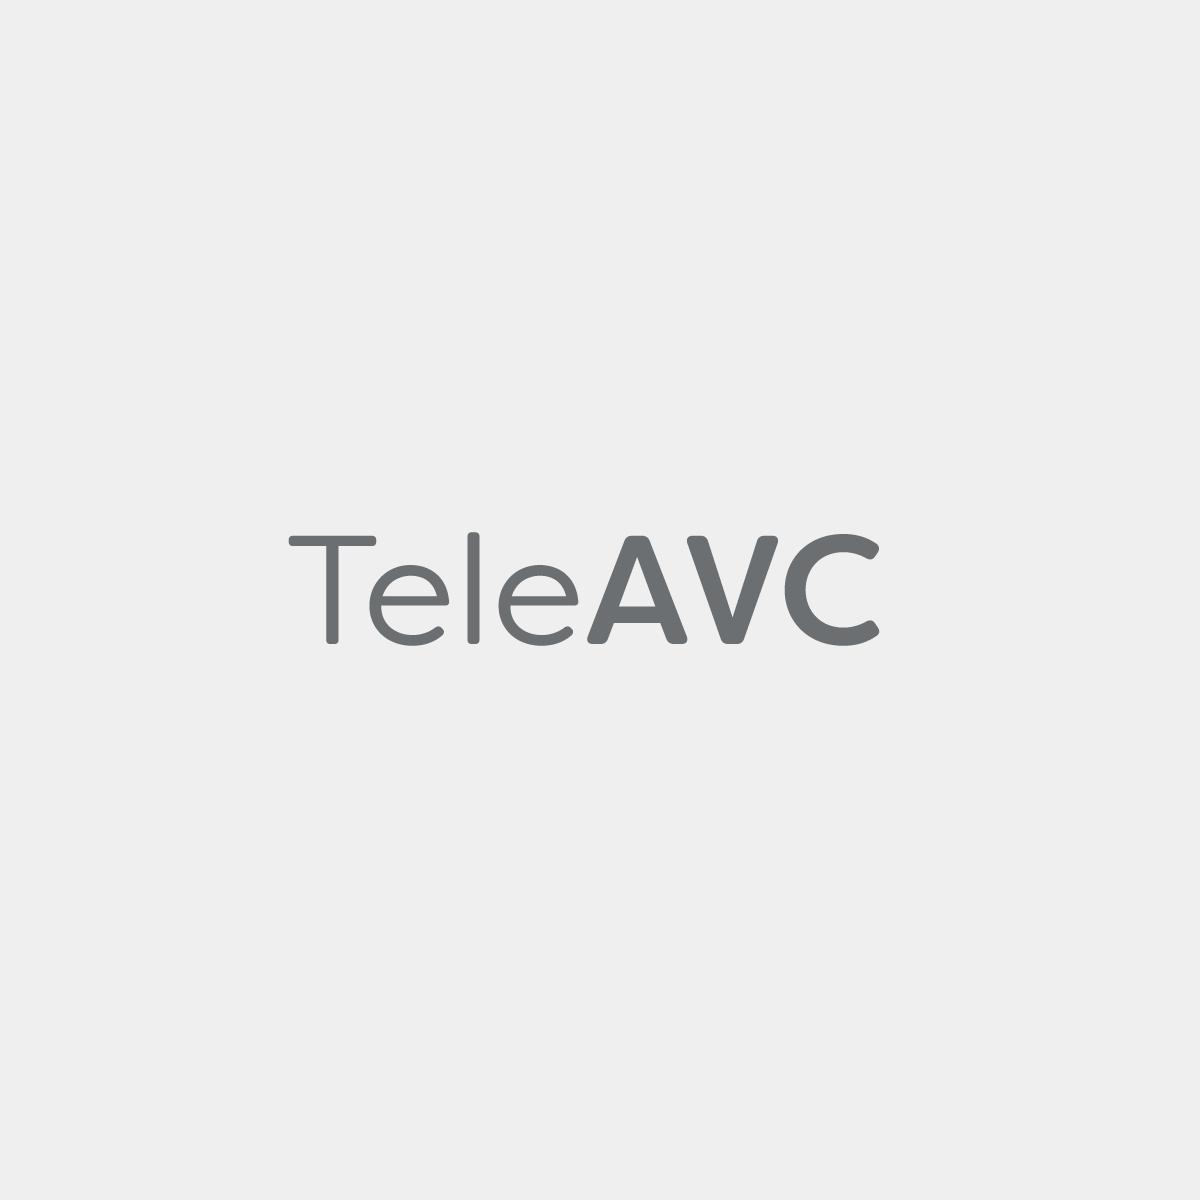 https://brasiltelemedicina.com.br/wp-content/uploads/2016/07/Produtos_TeleAVC-1200x1200.png